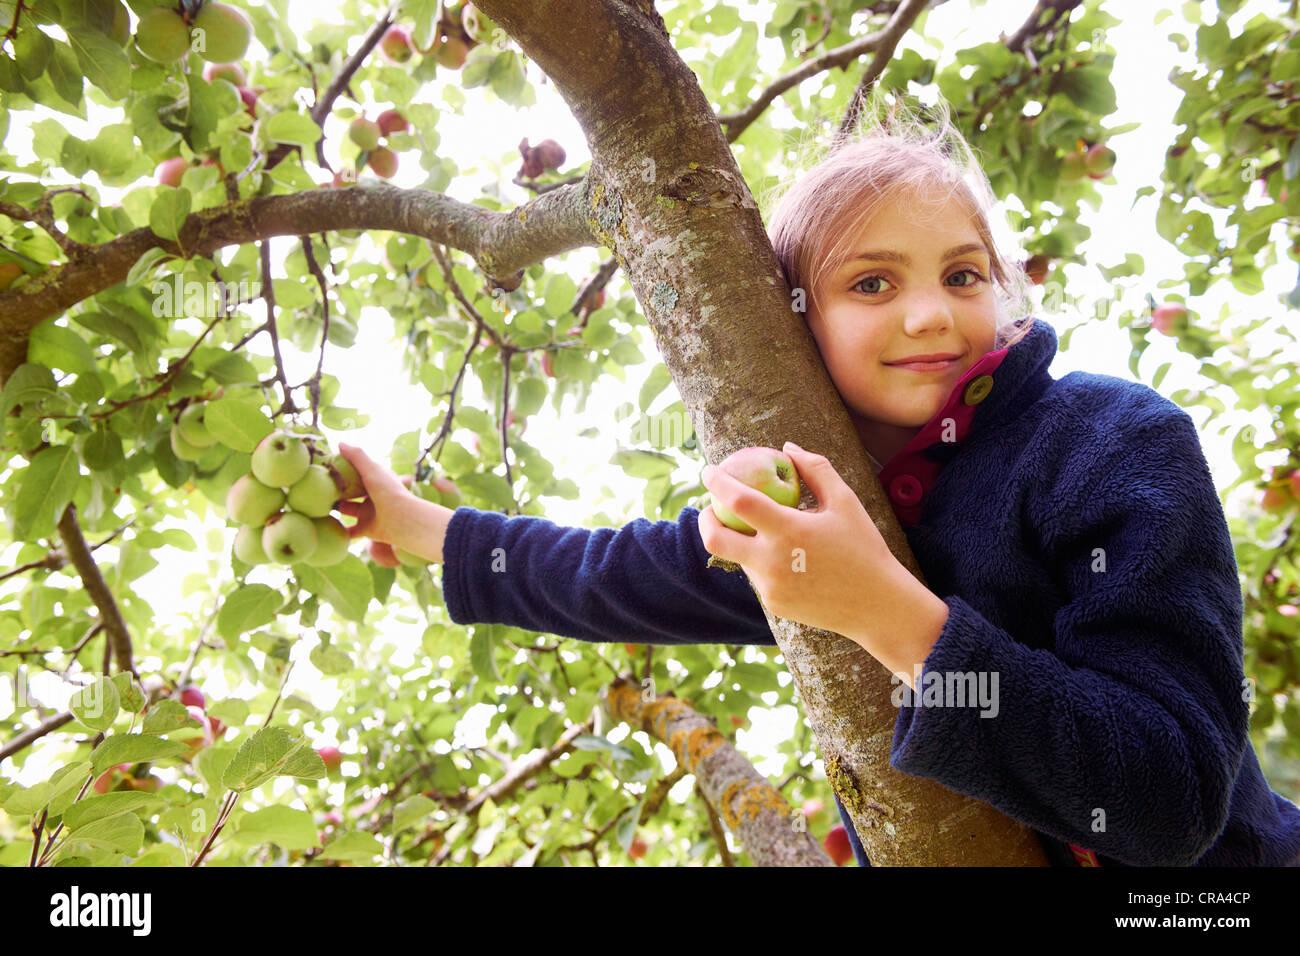 Smiling girl picking fruit from tree Stock Photo